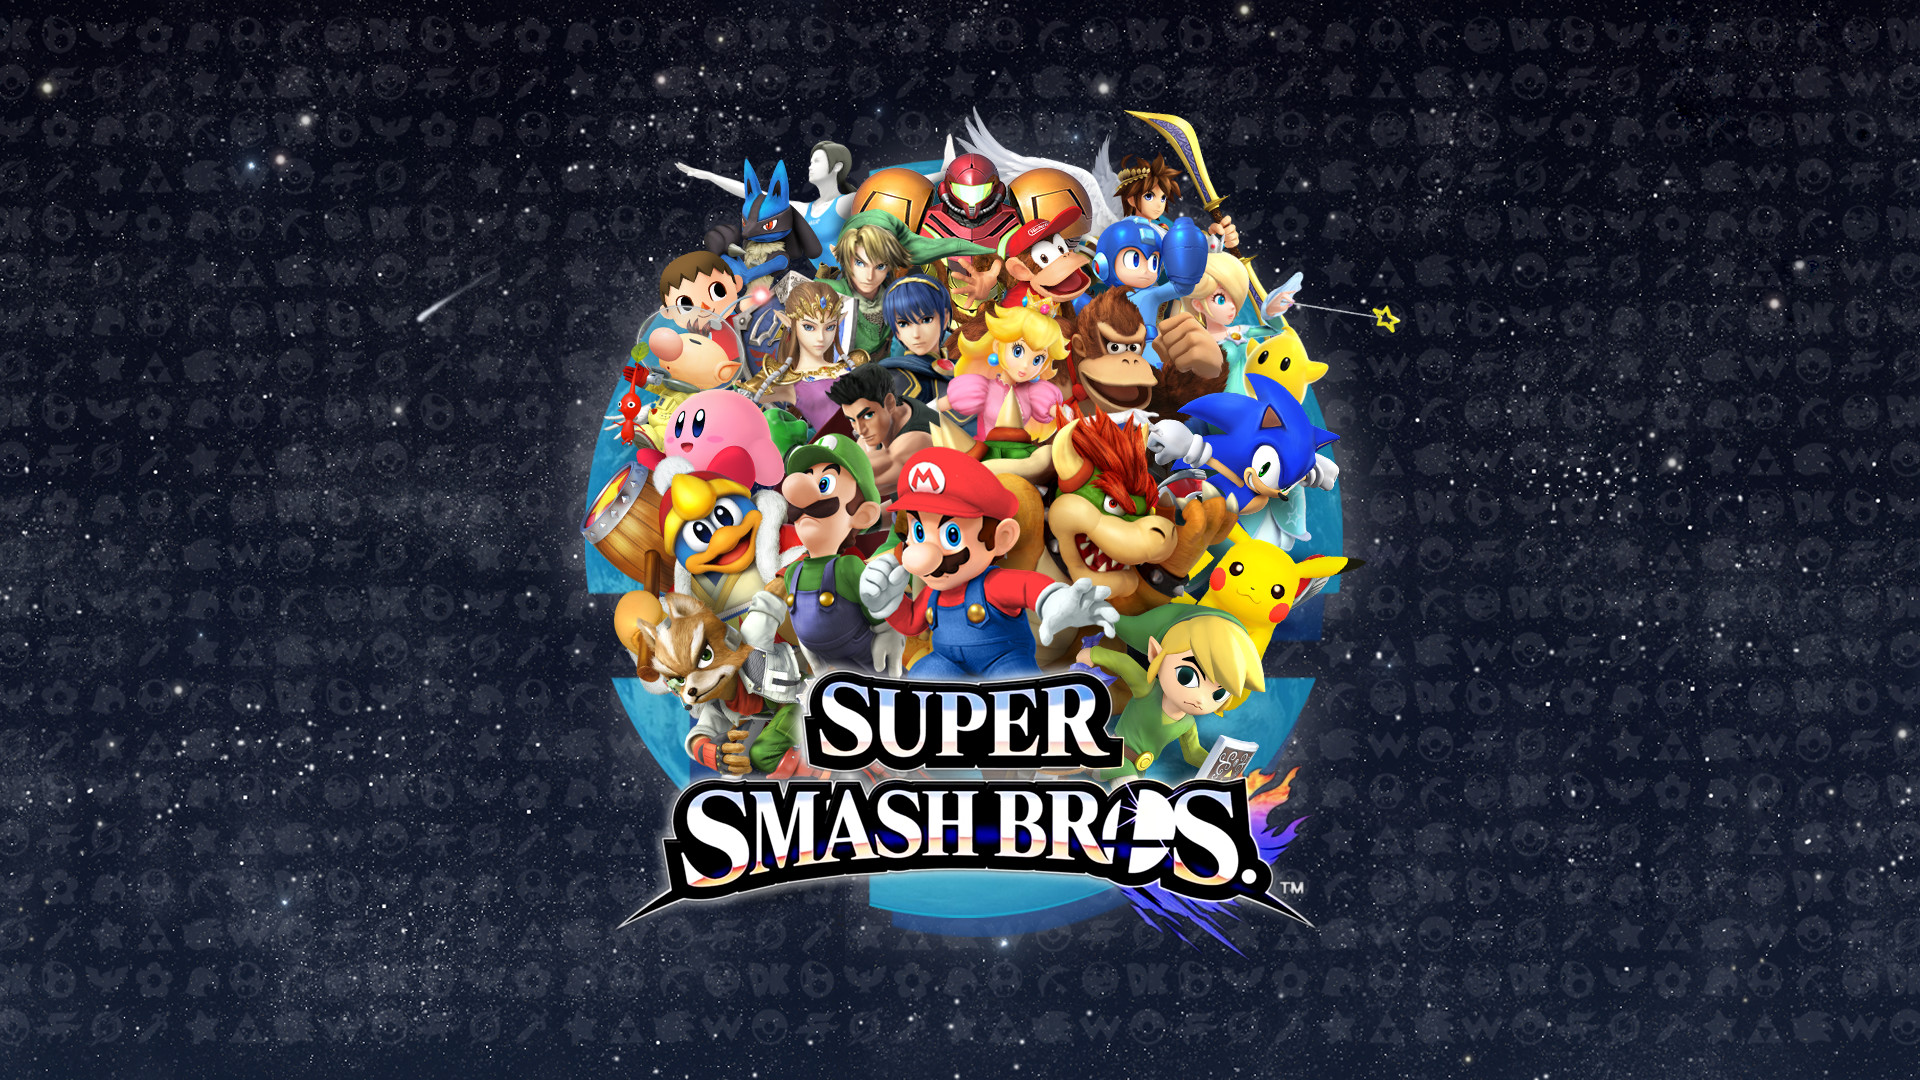 Free Photos Super Smash Bros Wallpaper HD.